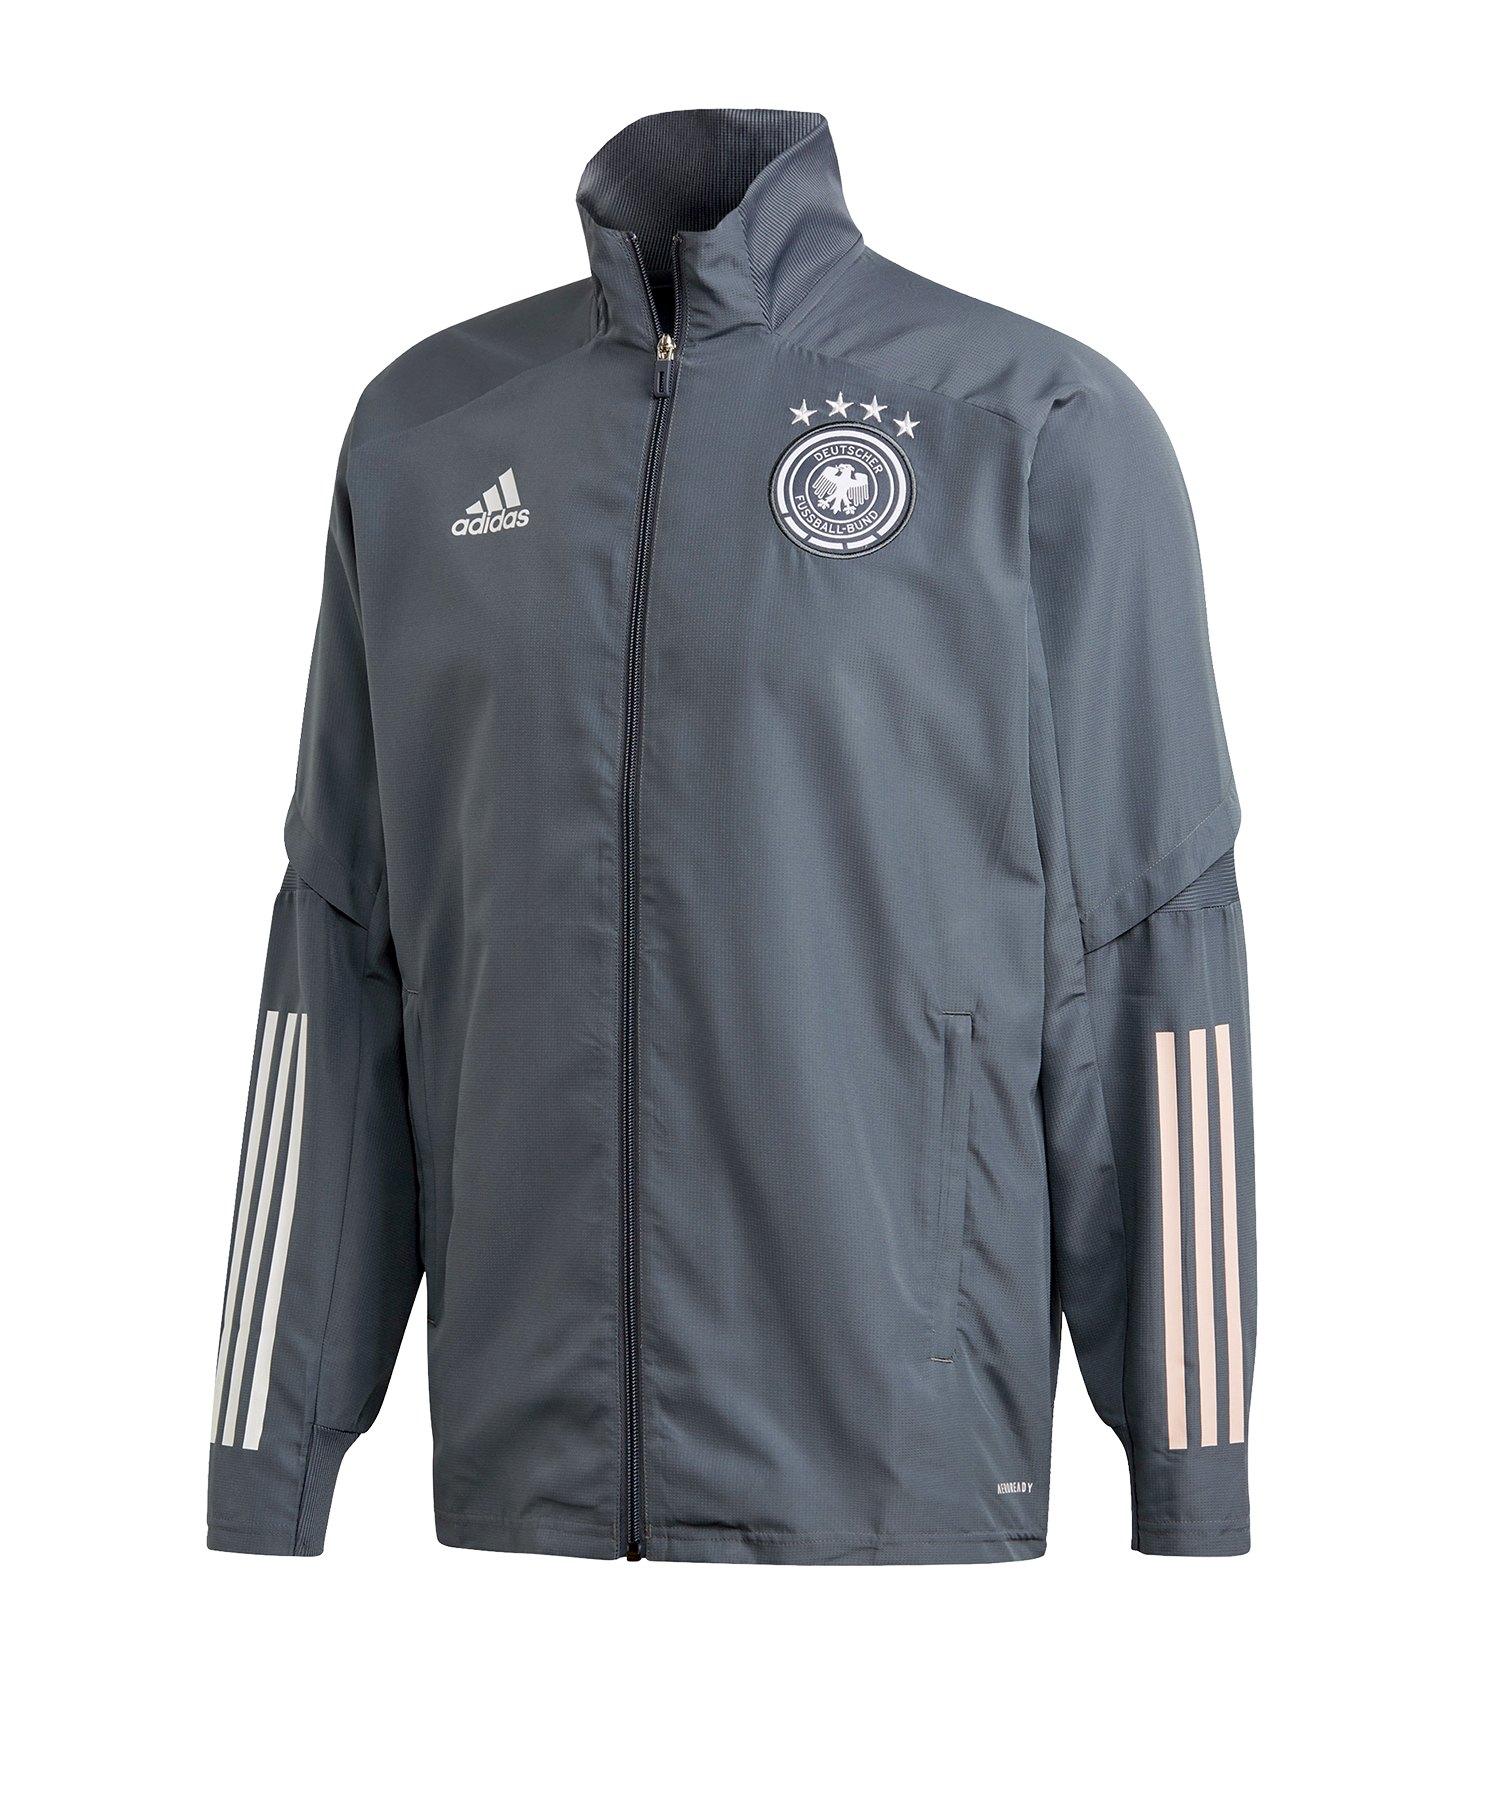 adidas DFB Deutschland Trainingsjacke Pre Grau - grau